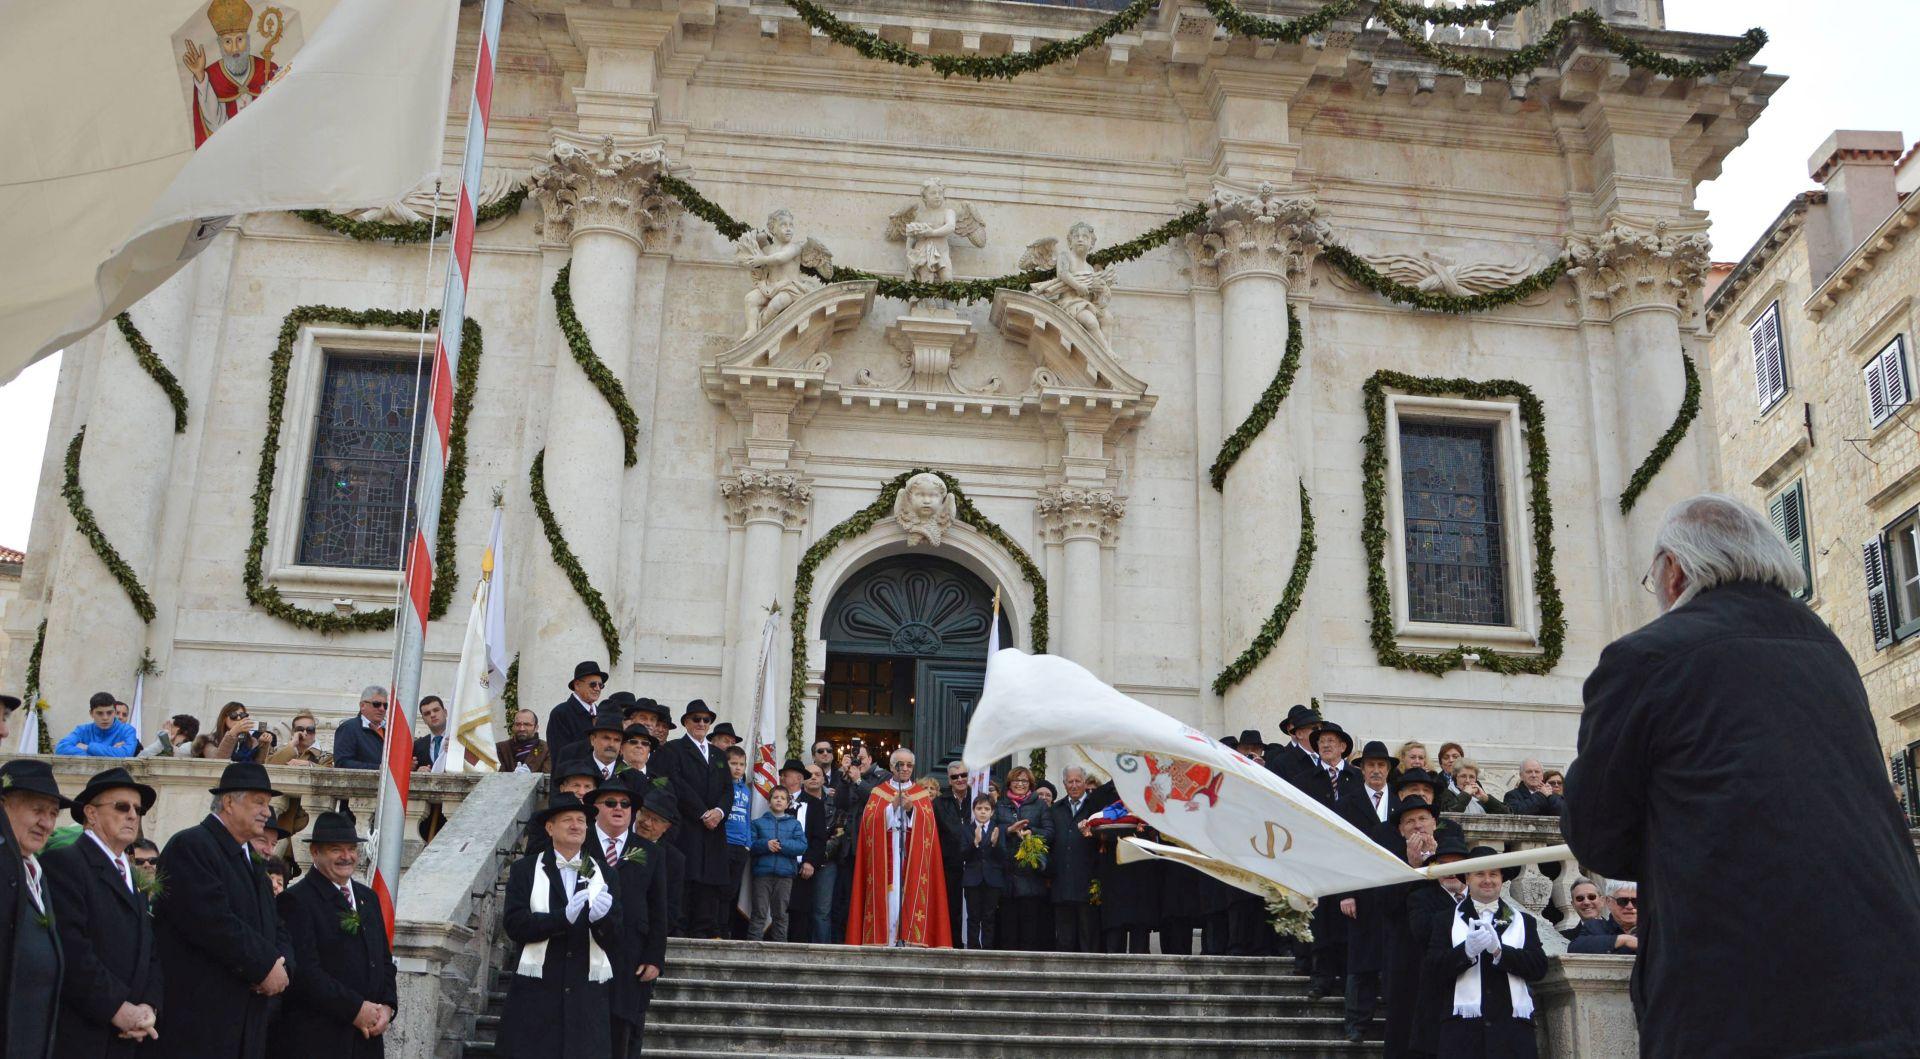 SPUŠTANJE BARJAKA: Završena Festa svetog Vlaha